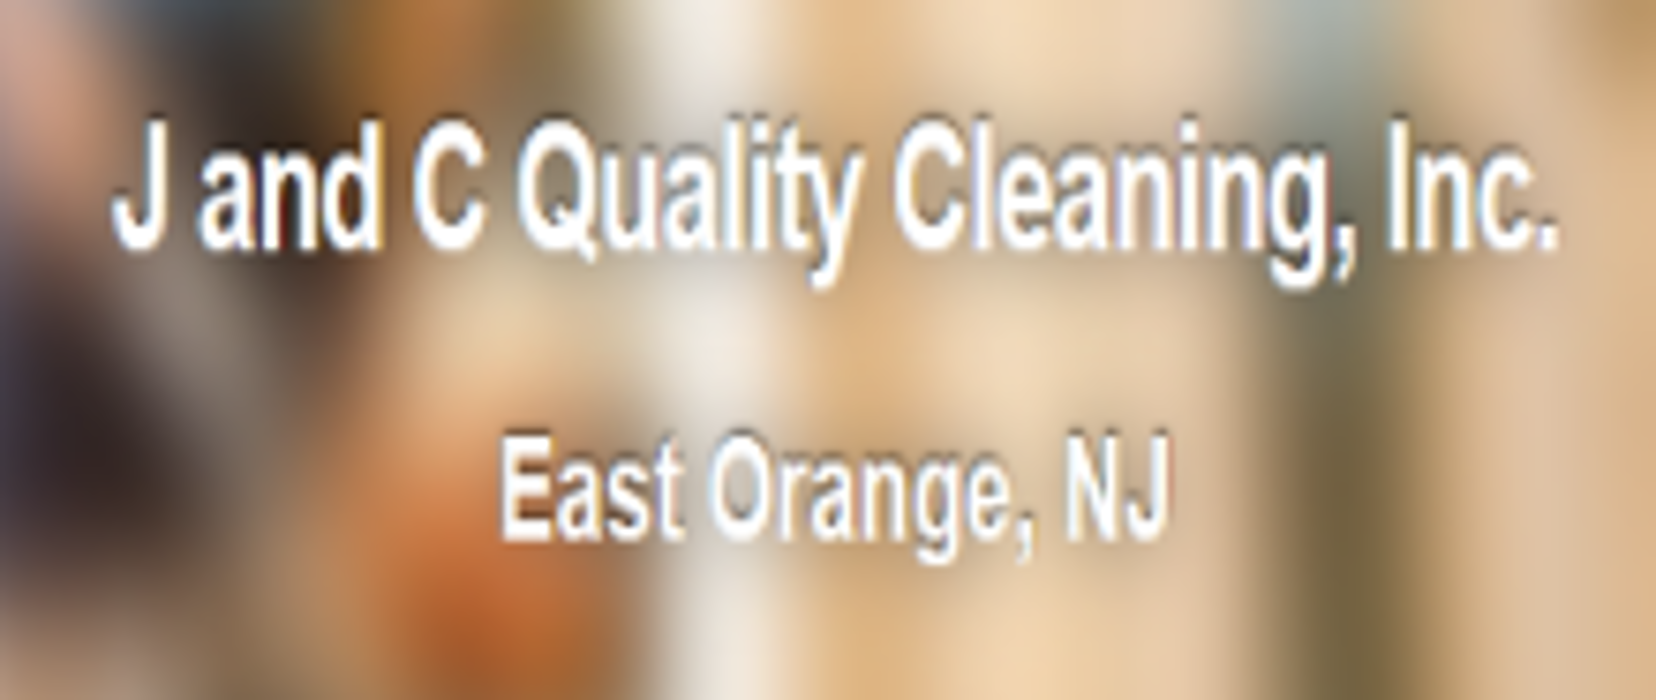 J and C Quality Cleaning, Inc. - East Orange, NJ